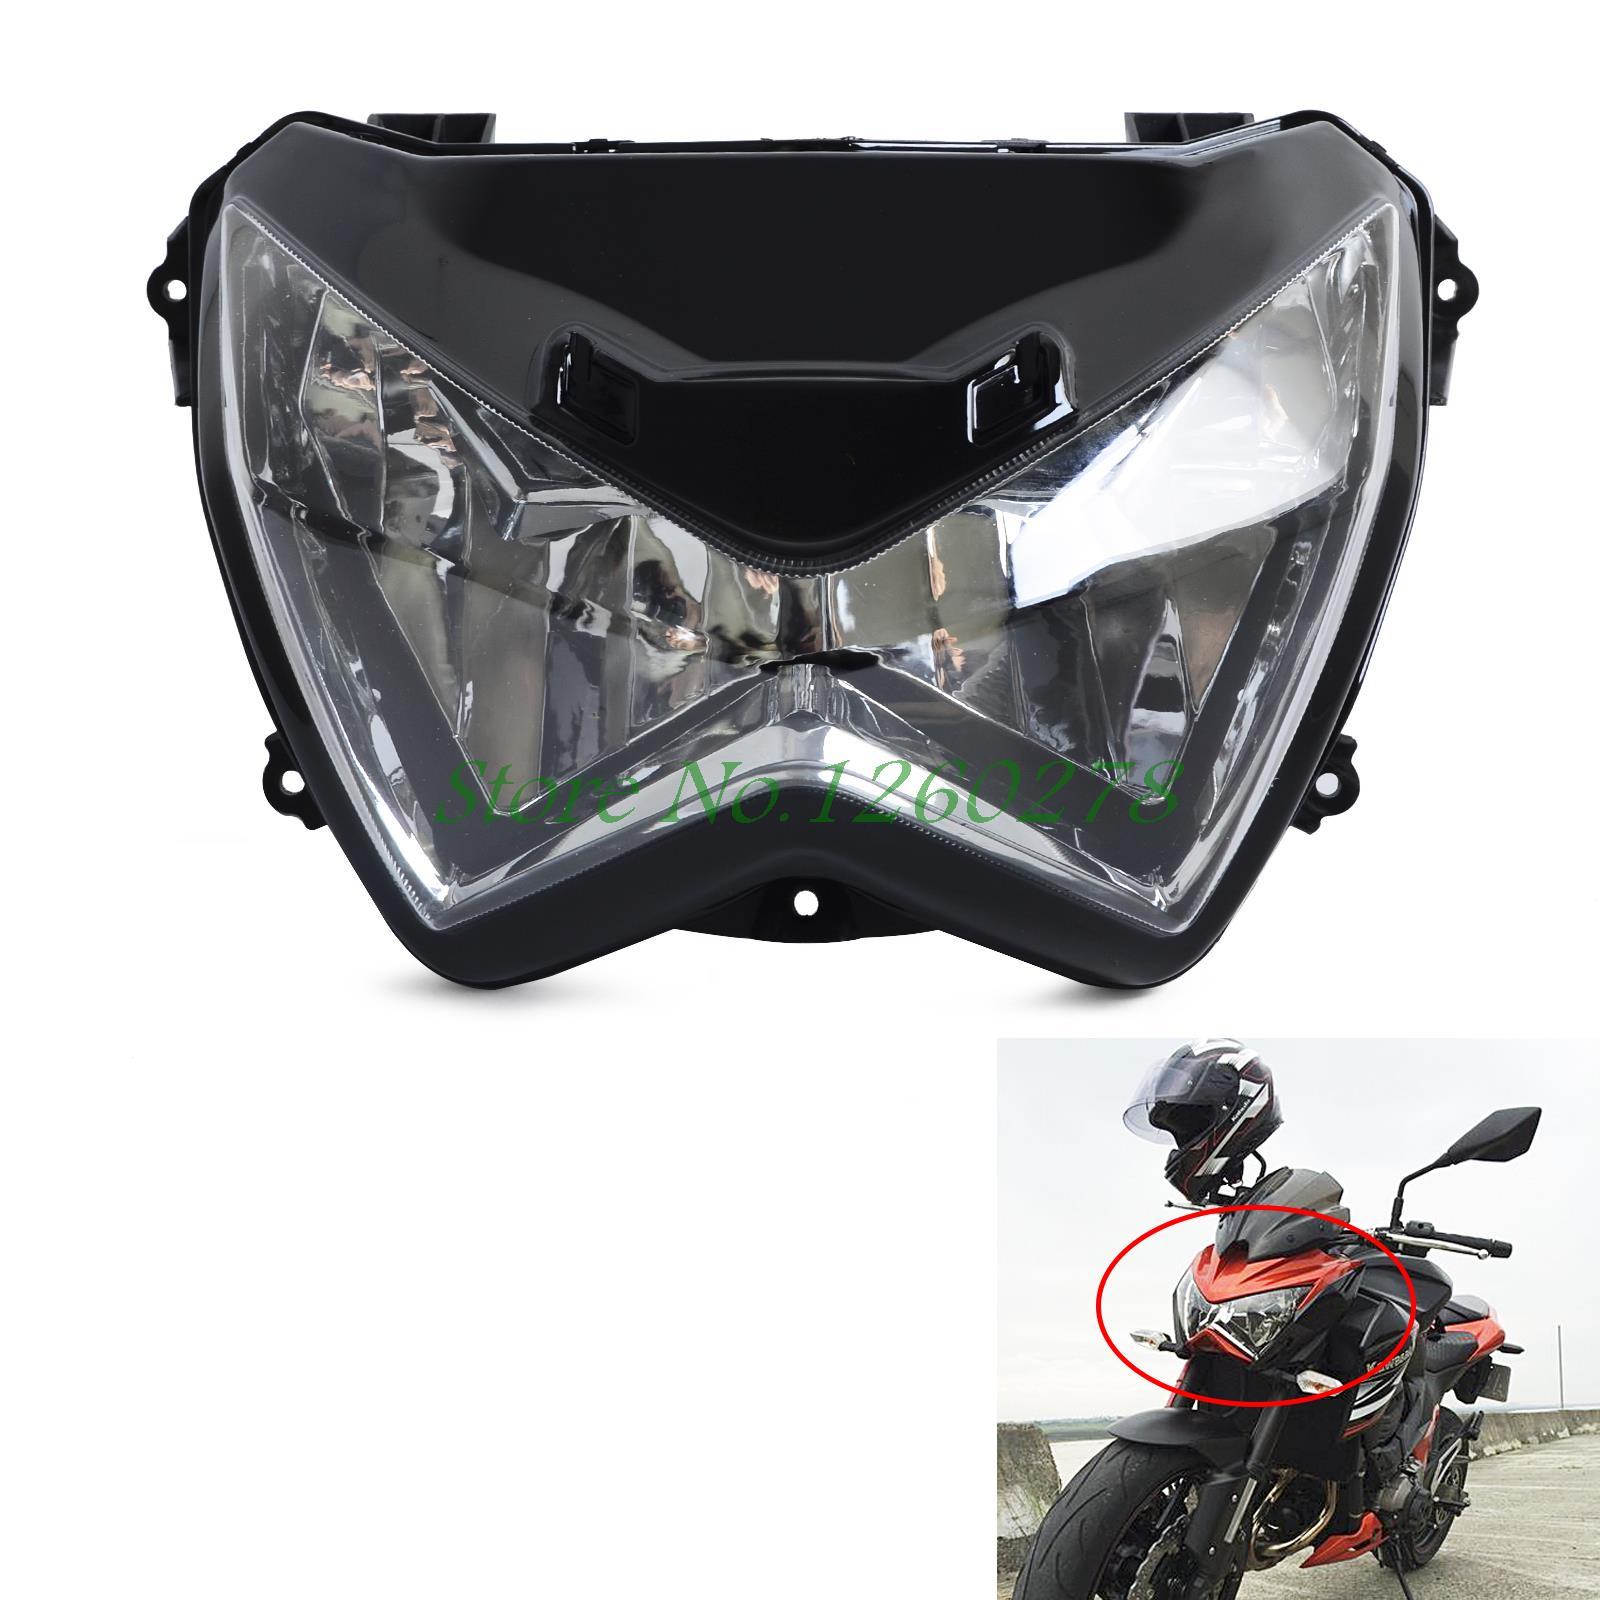 Motorcycle Headlight Headlamp Head Light Lamp Assembly For Kawasaki Z800 Z250 2013 -2016 Z300 2015 2016 Faro De La Motocicleta